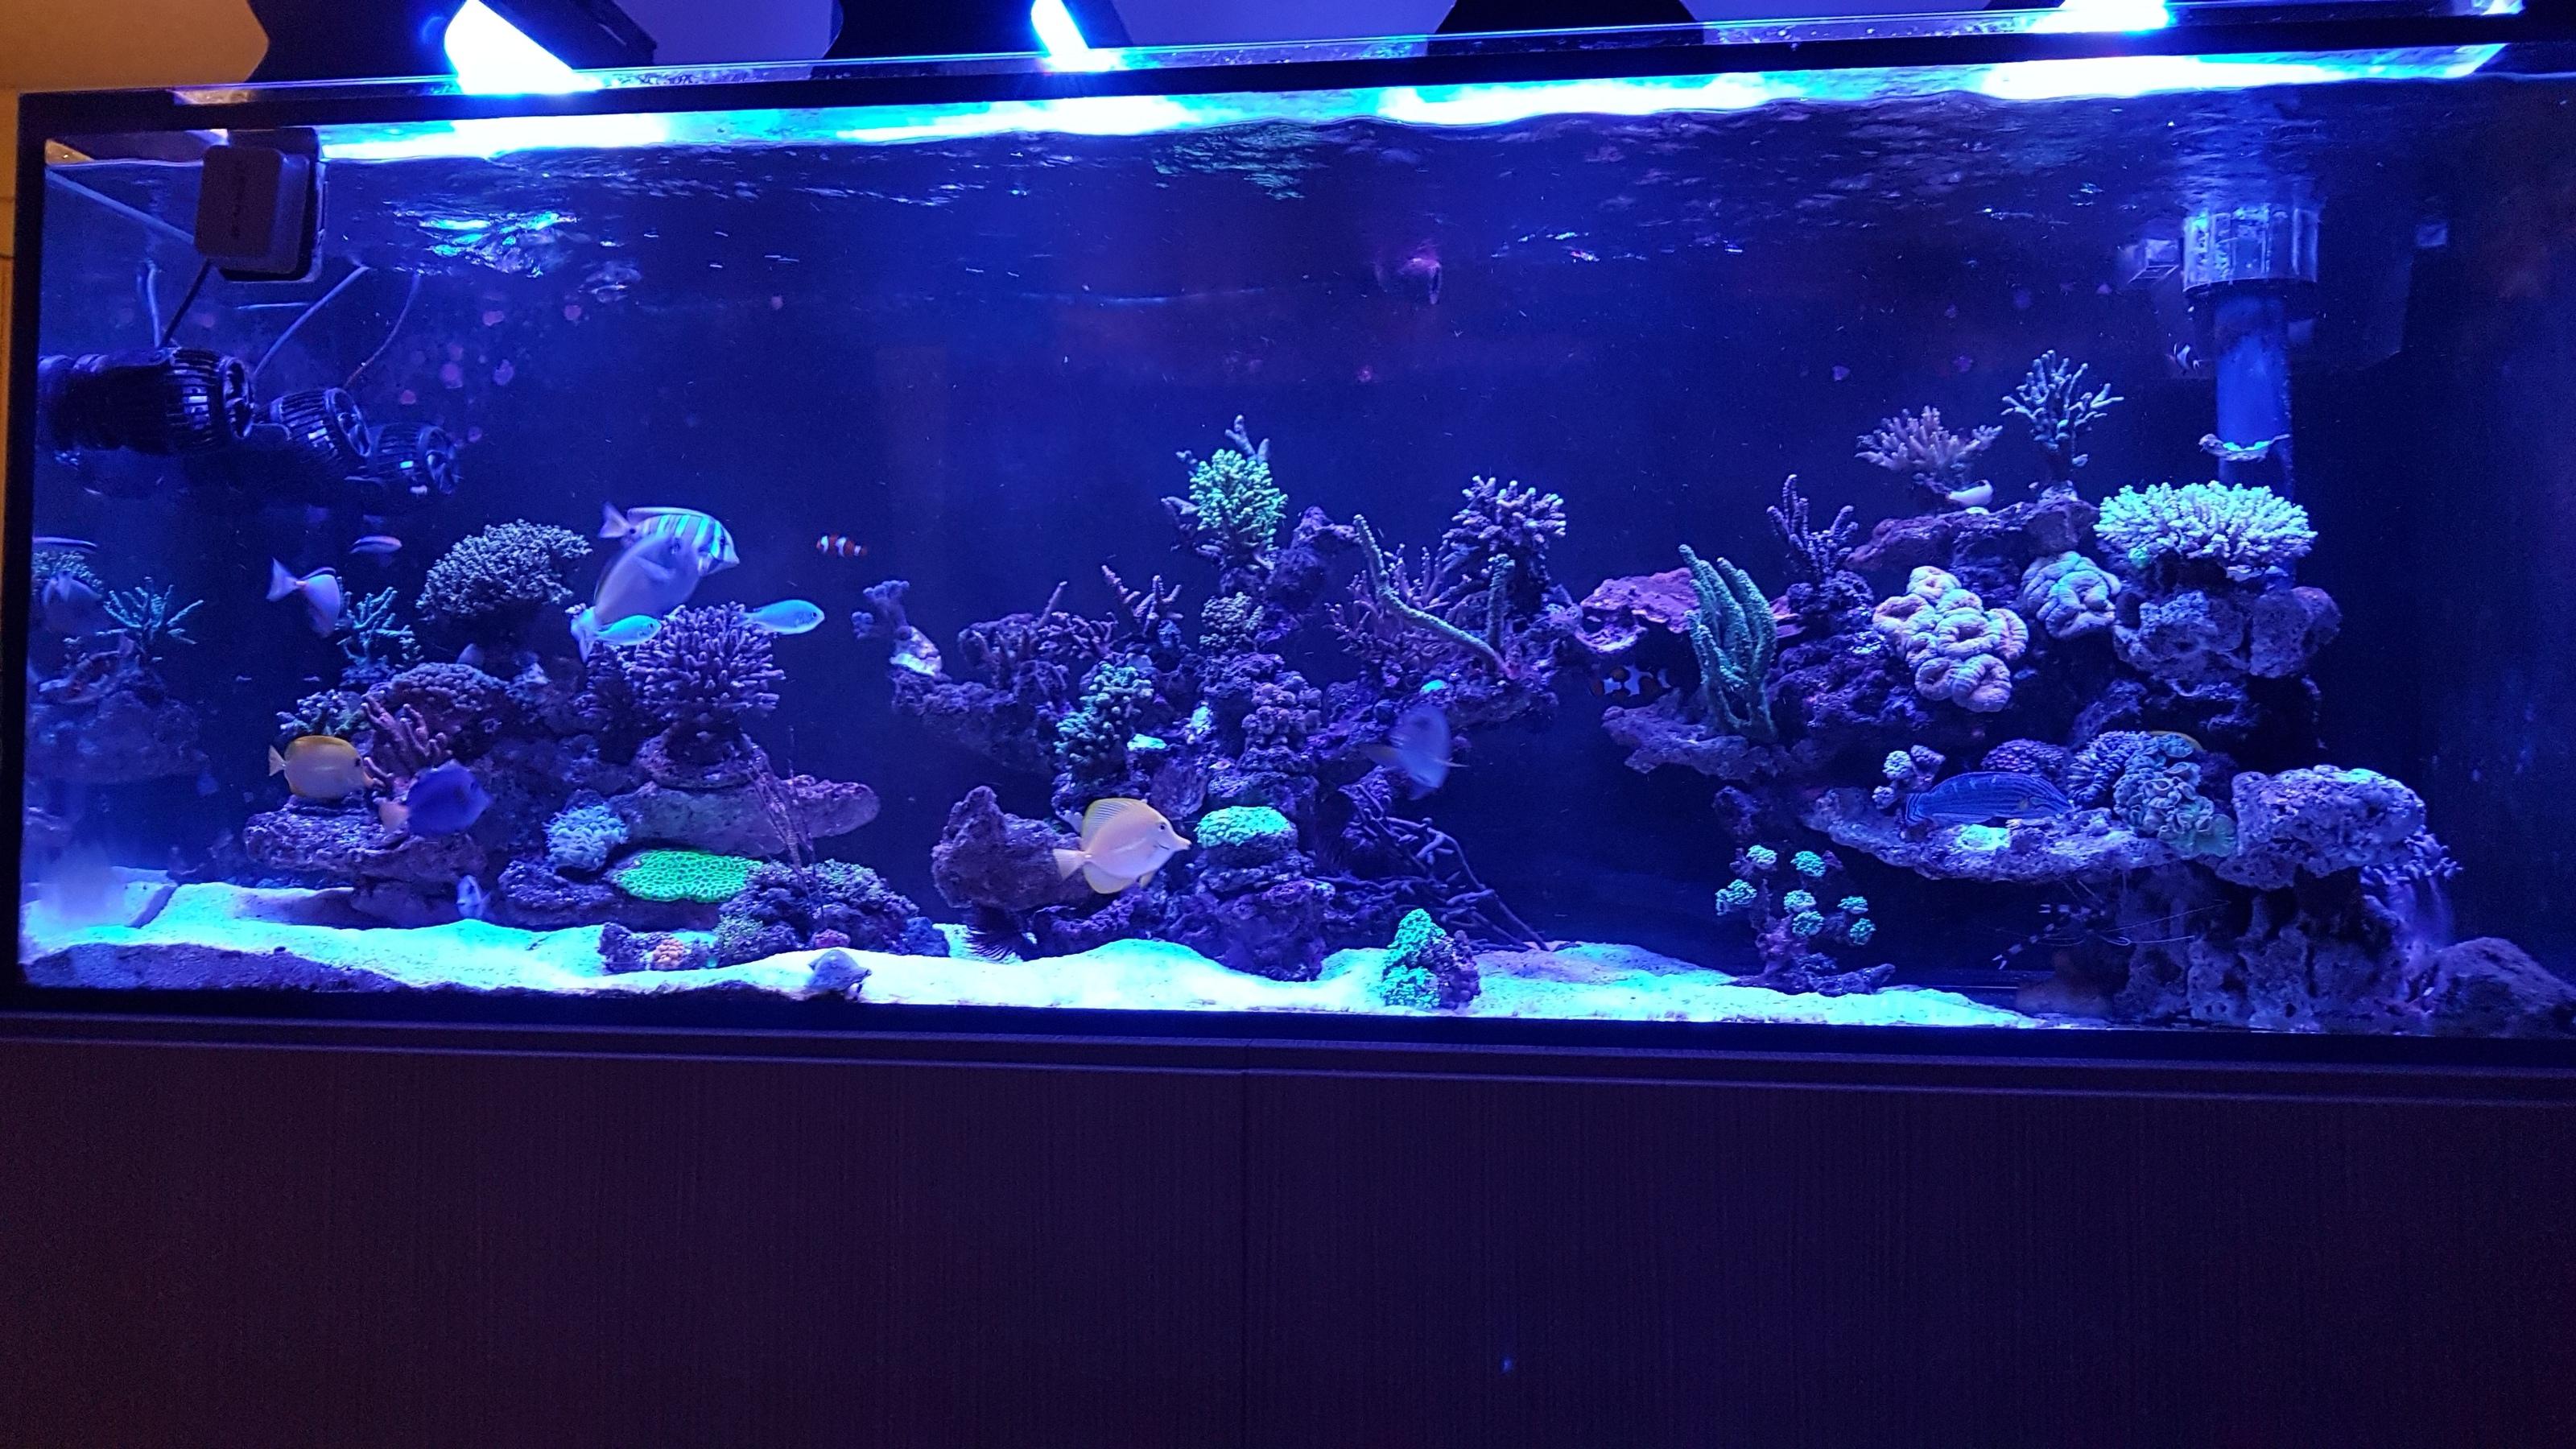 Spy74 reef